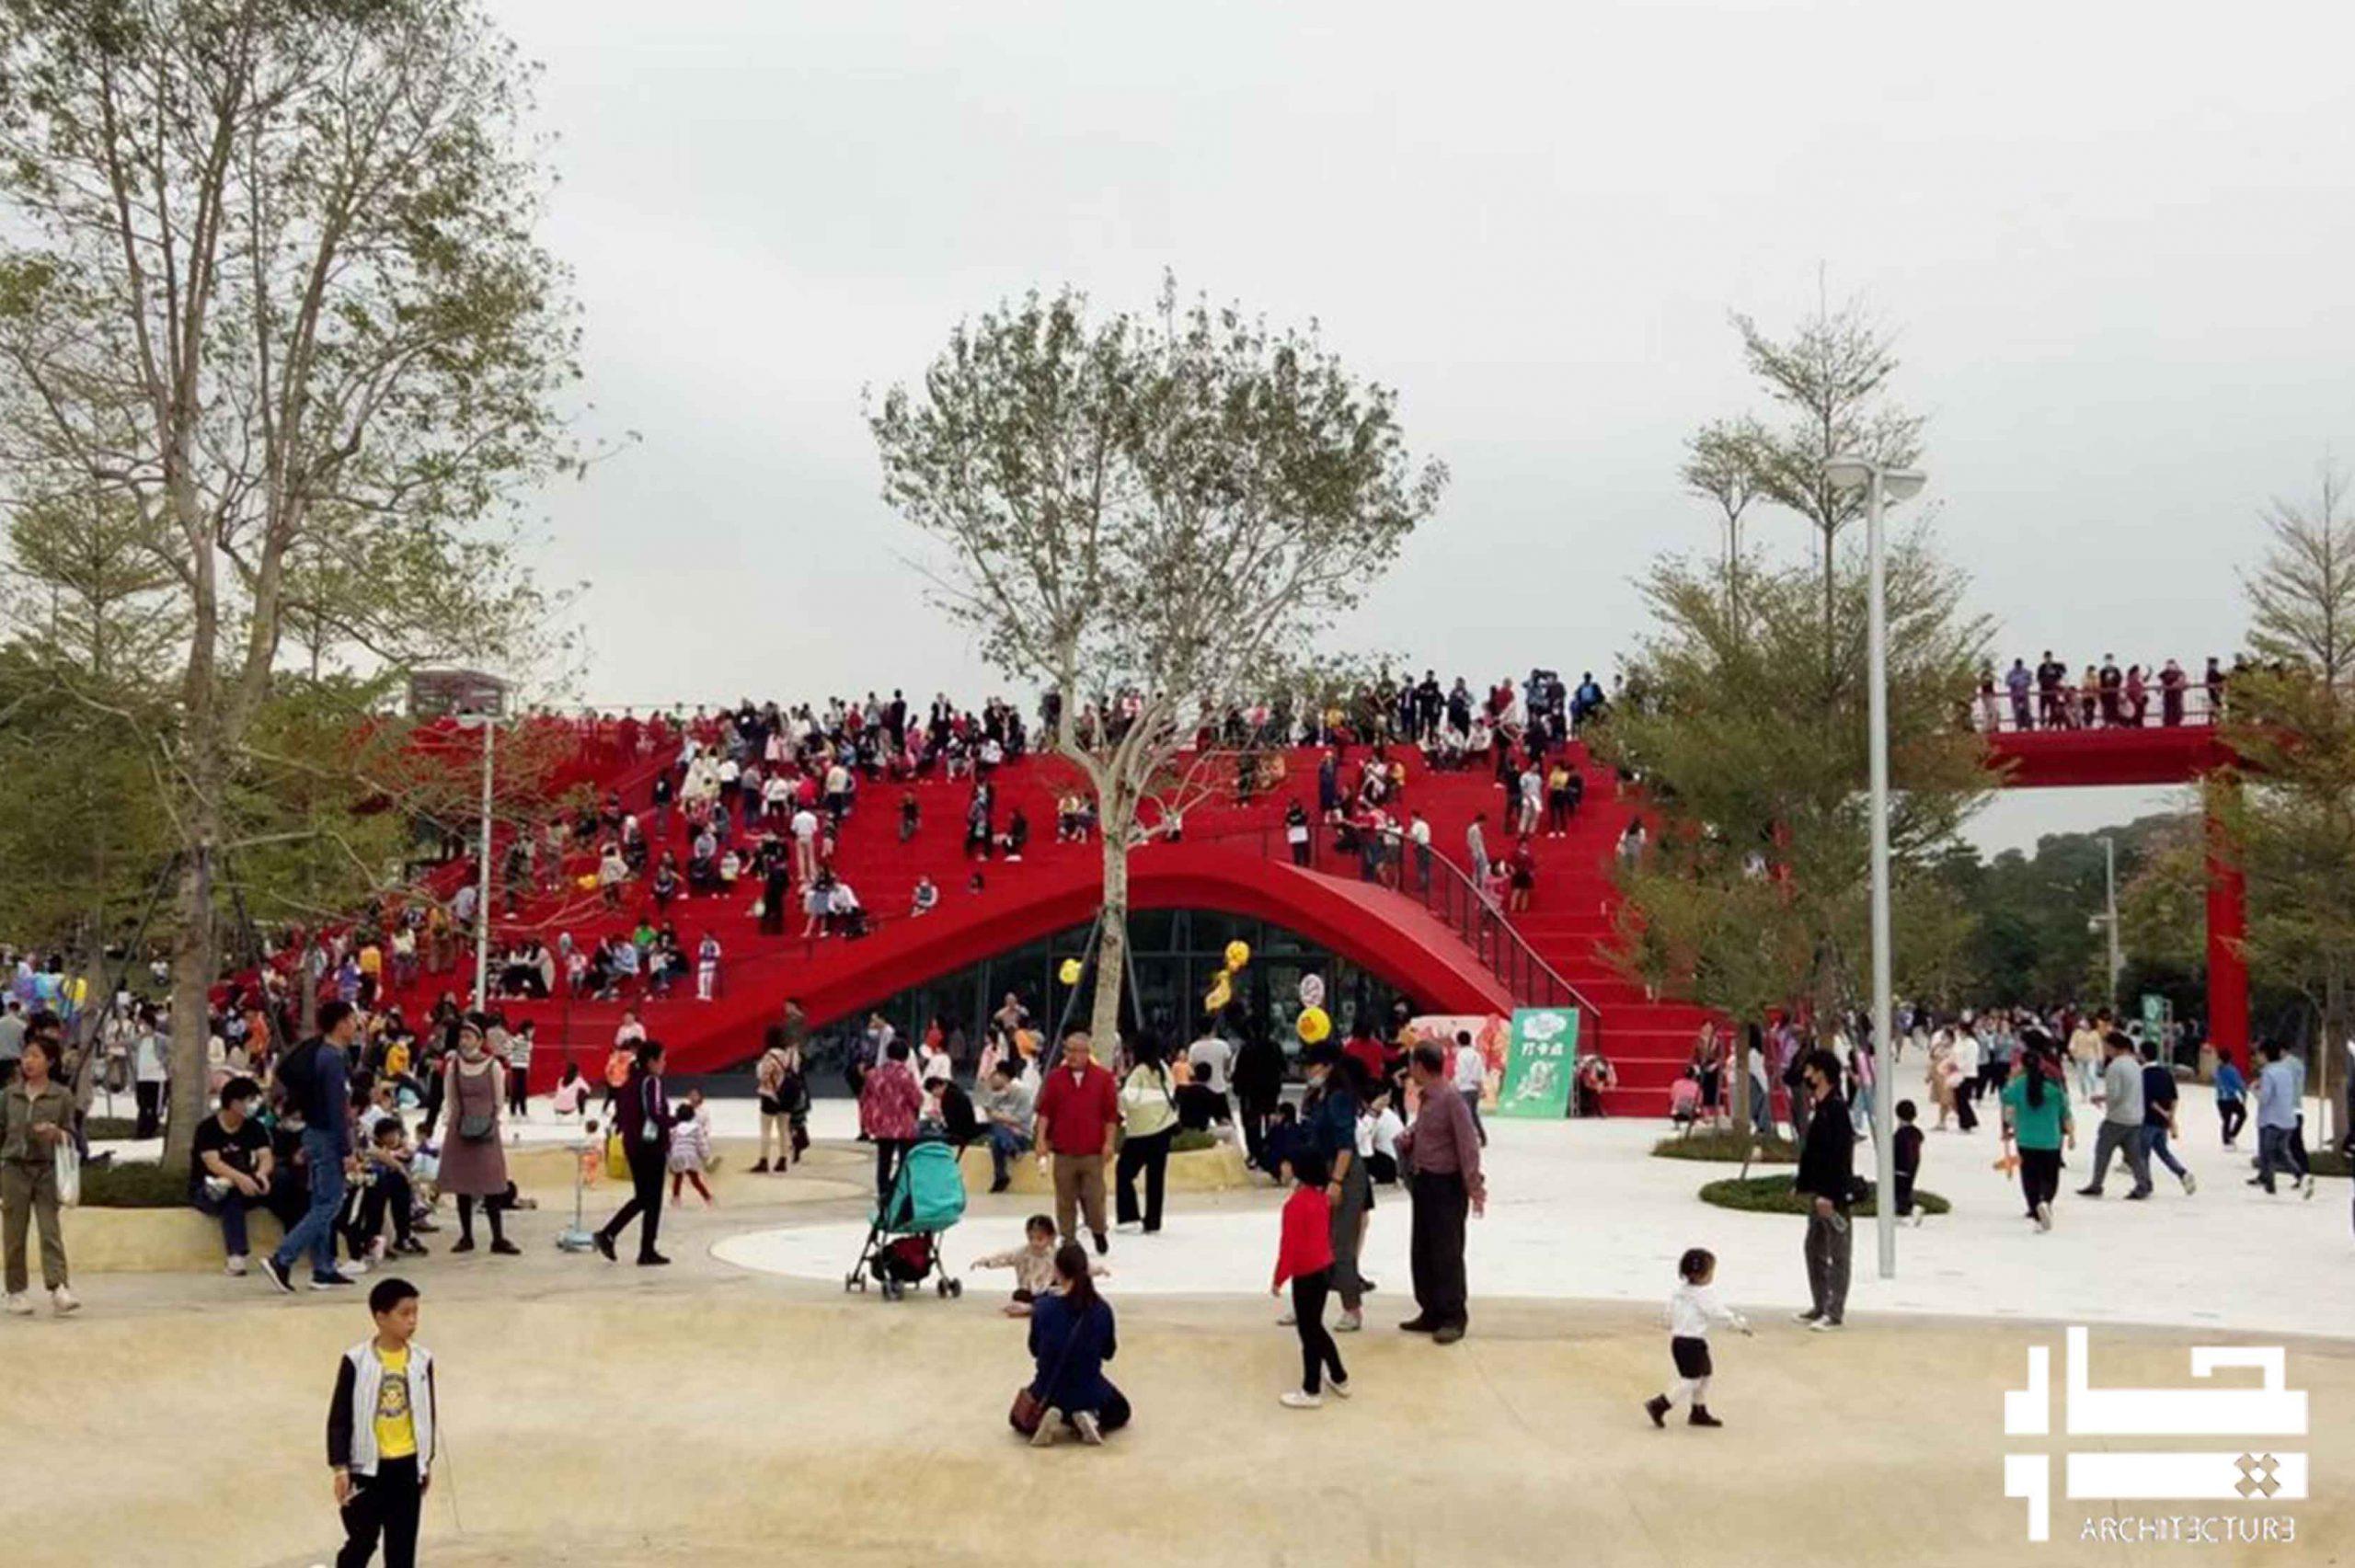 پارک جنگلی ورزشی گوانگمینگ